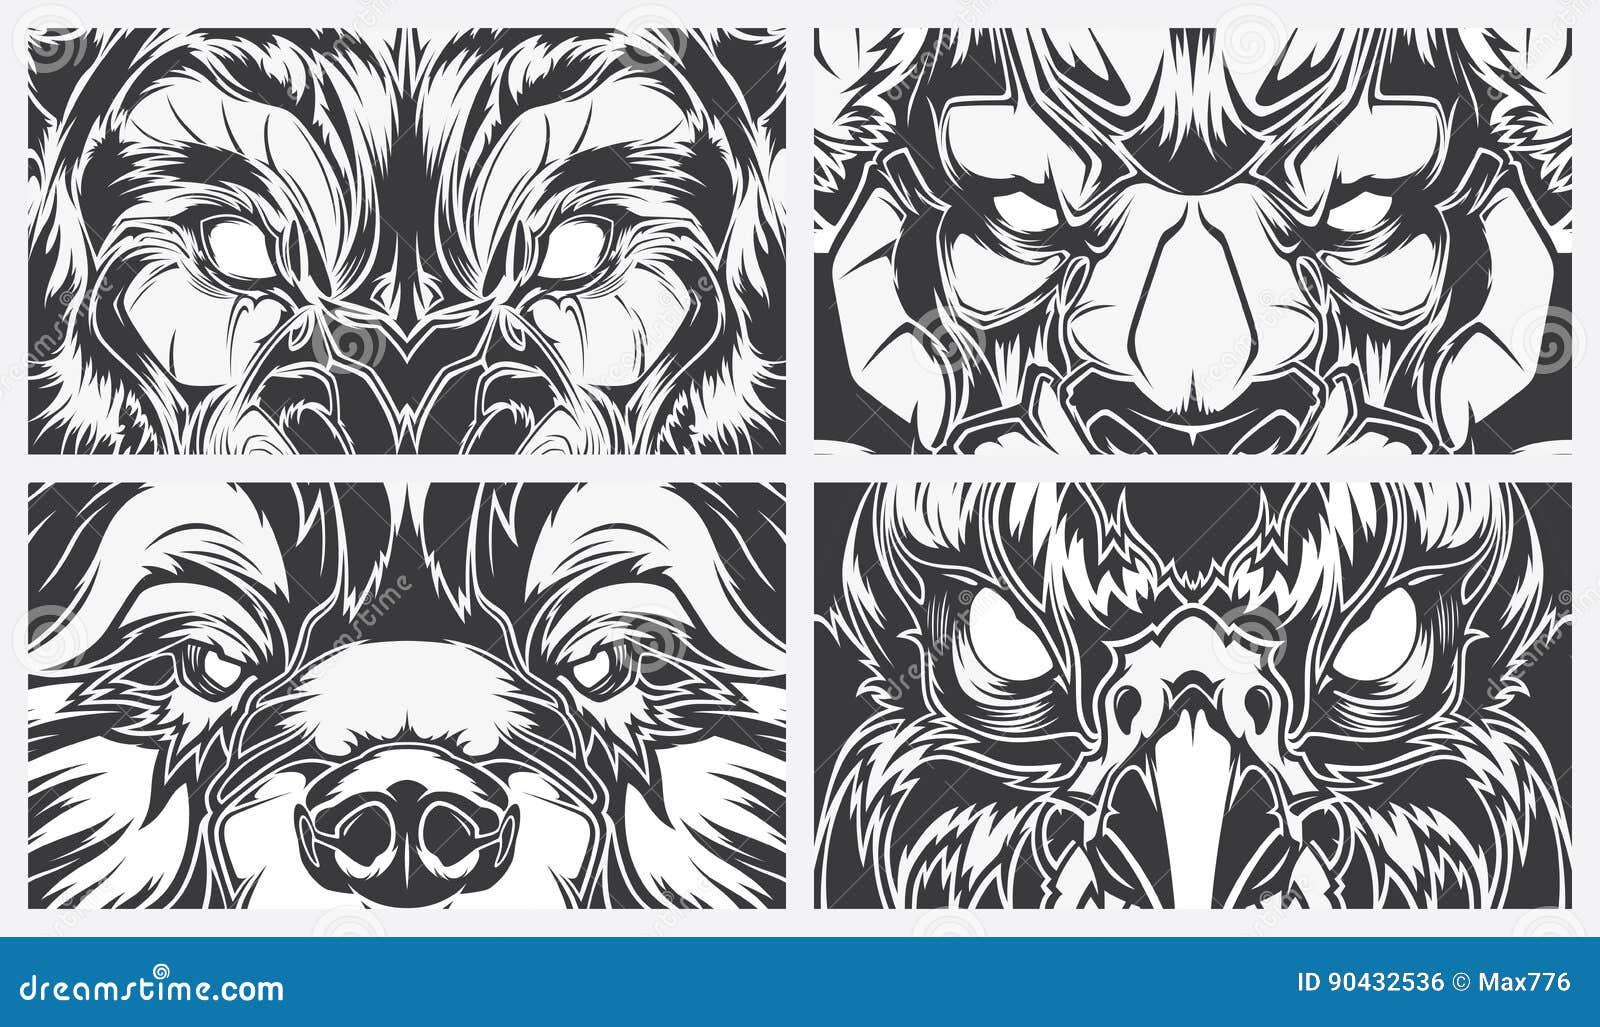 Line Art Animals Tattoo : Eyes dangerous animals tattoo style vector background stock